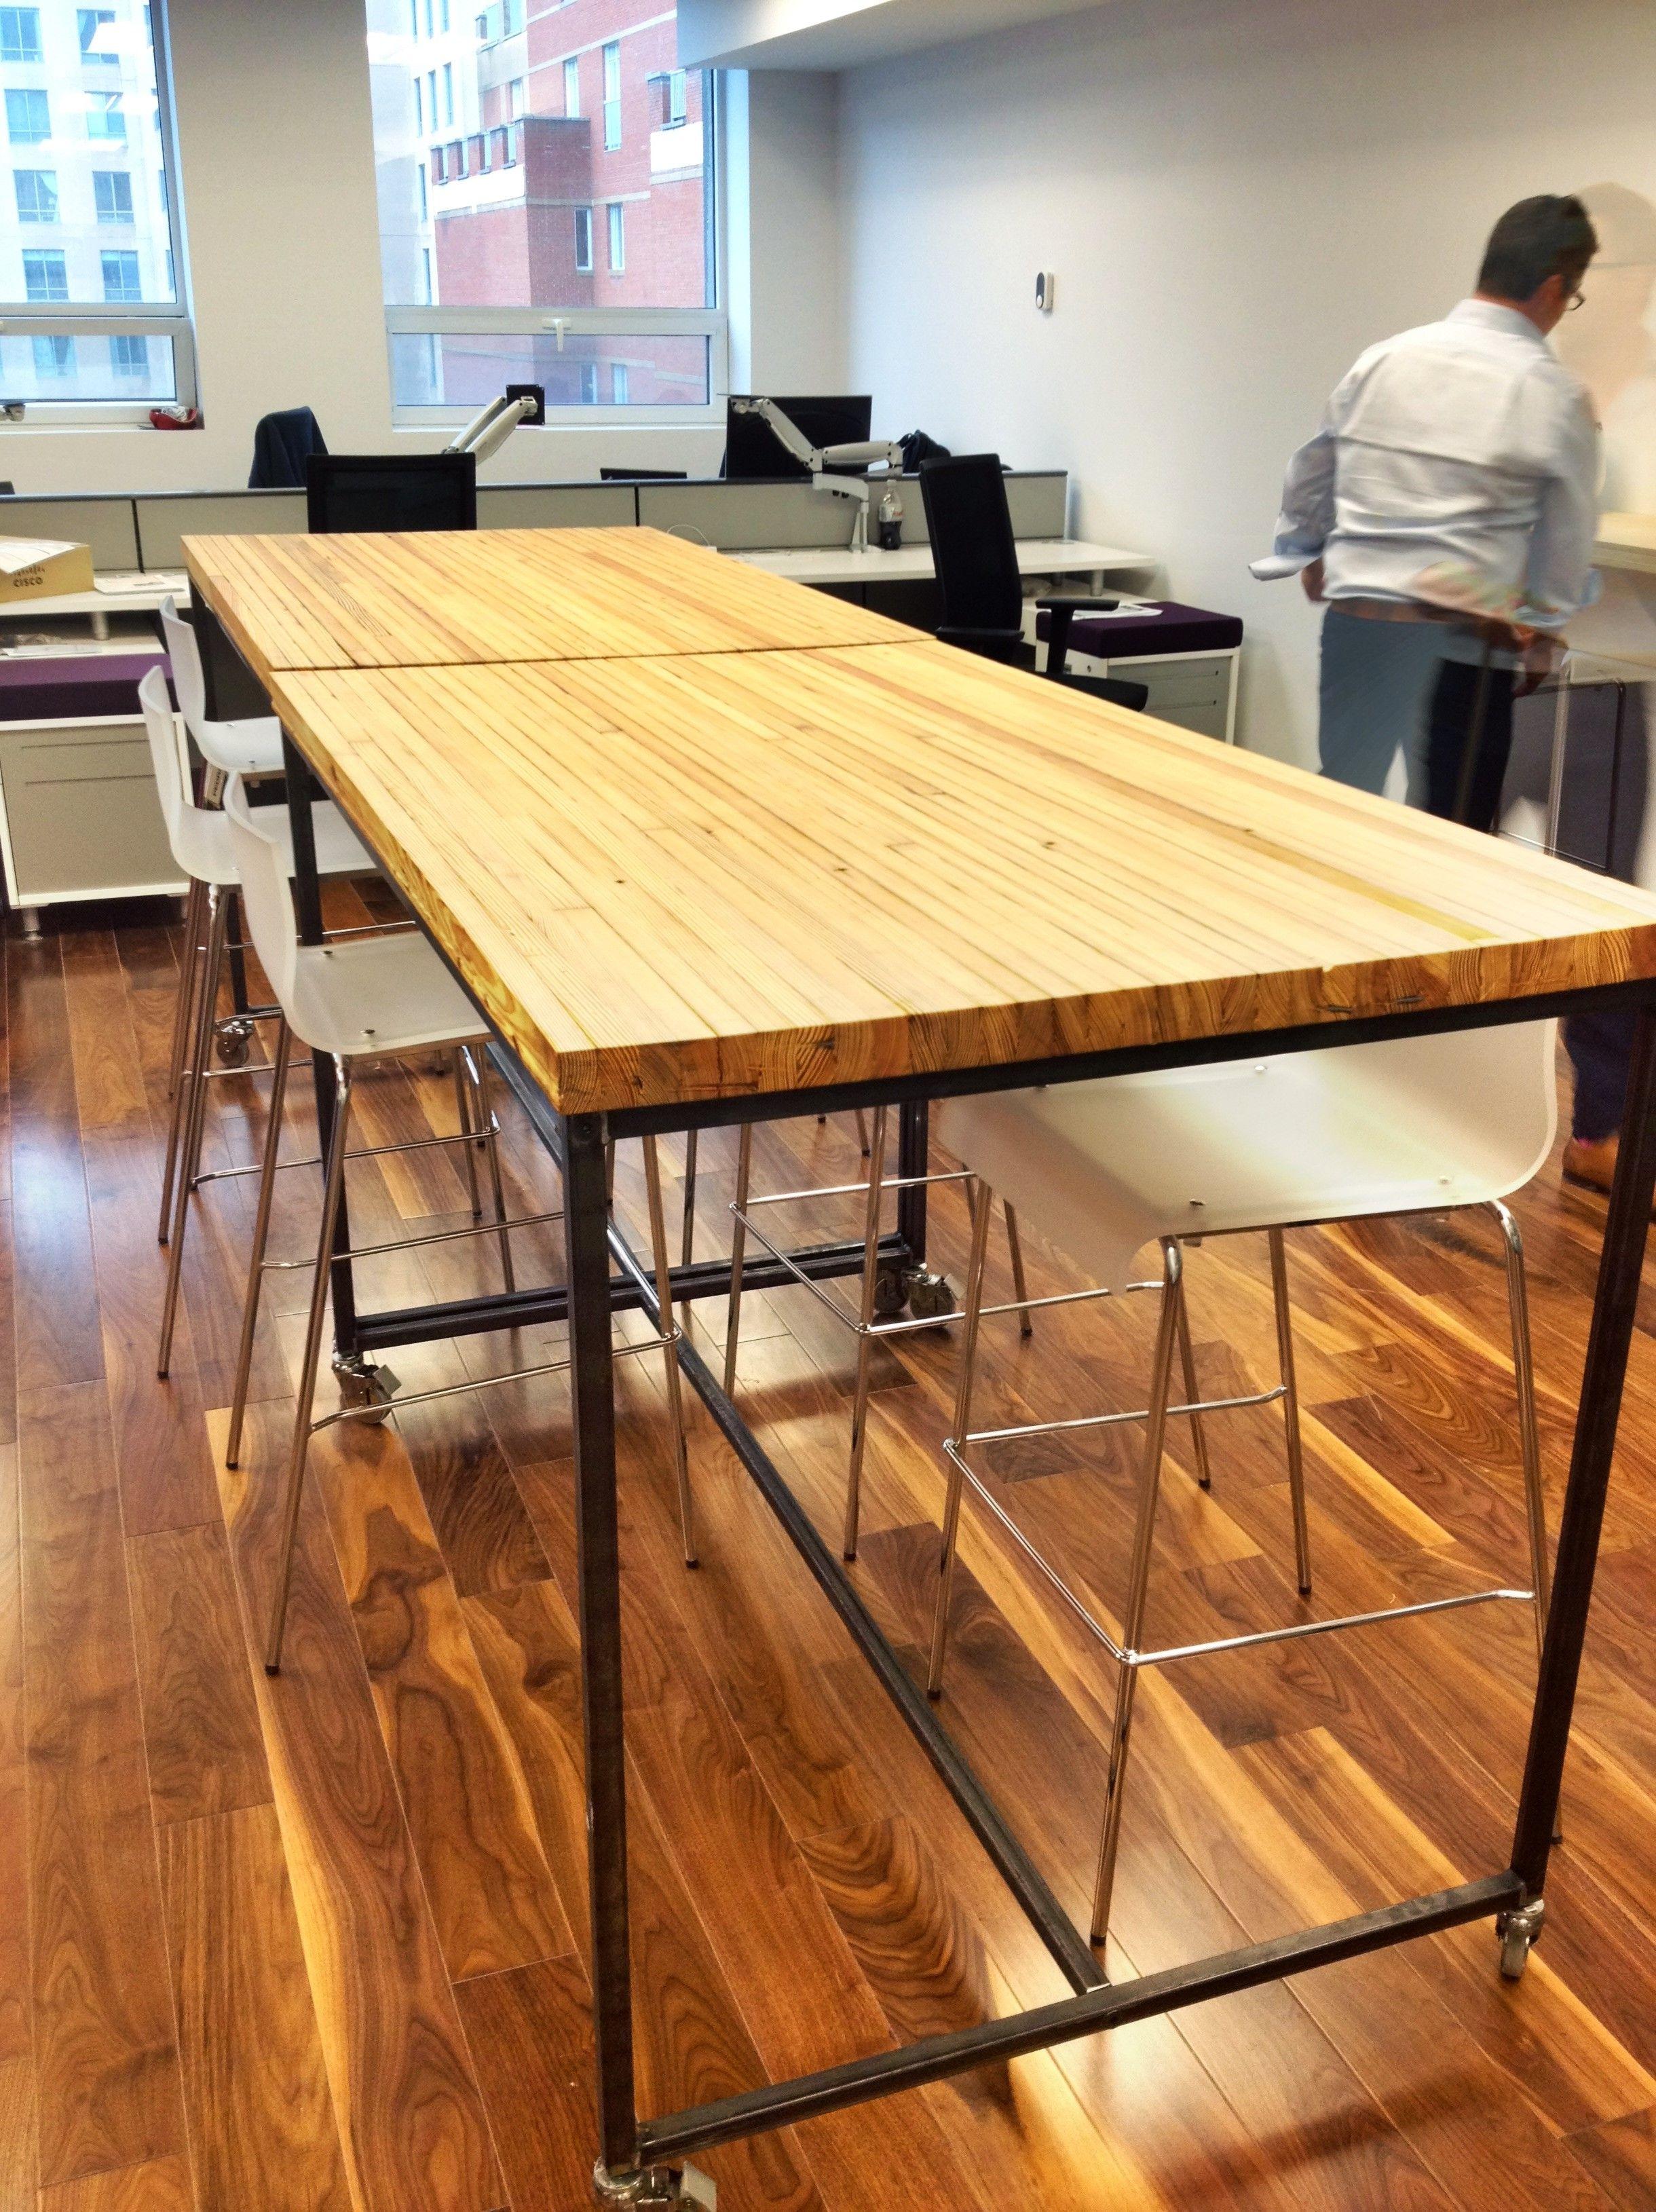 9b0742e702109c96ad0199e4260fff25 Incroyable De Table Balcon Suspendue Ikea Concept